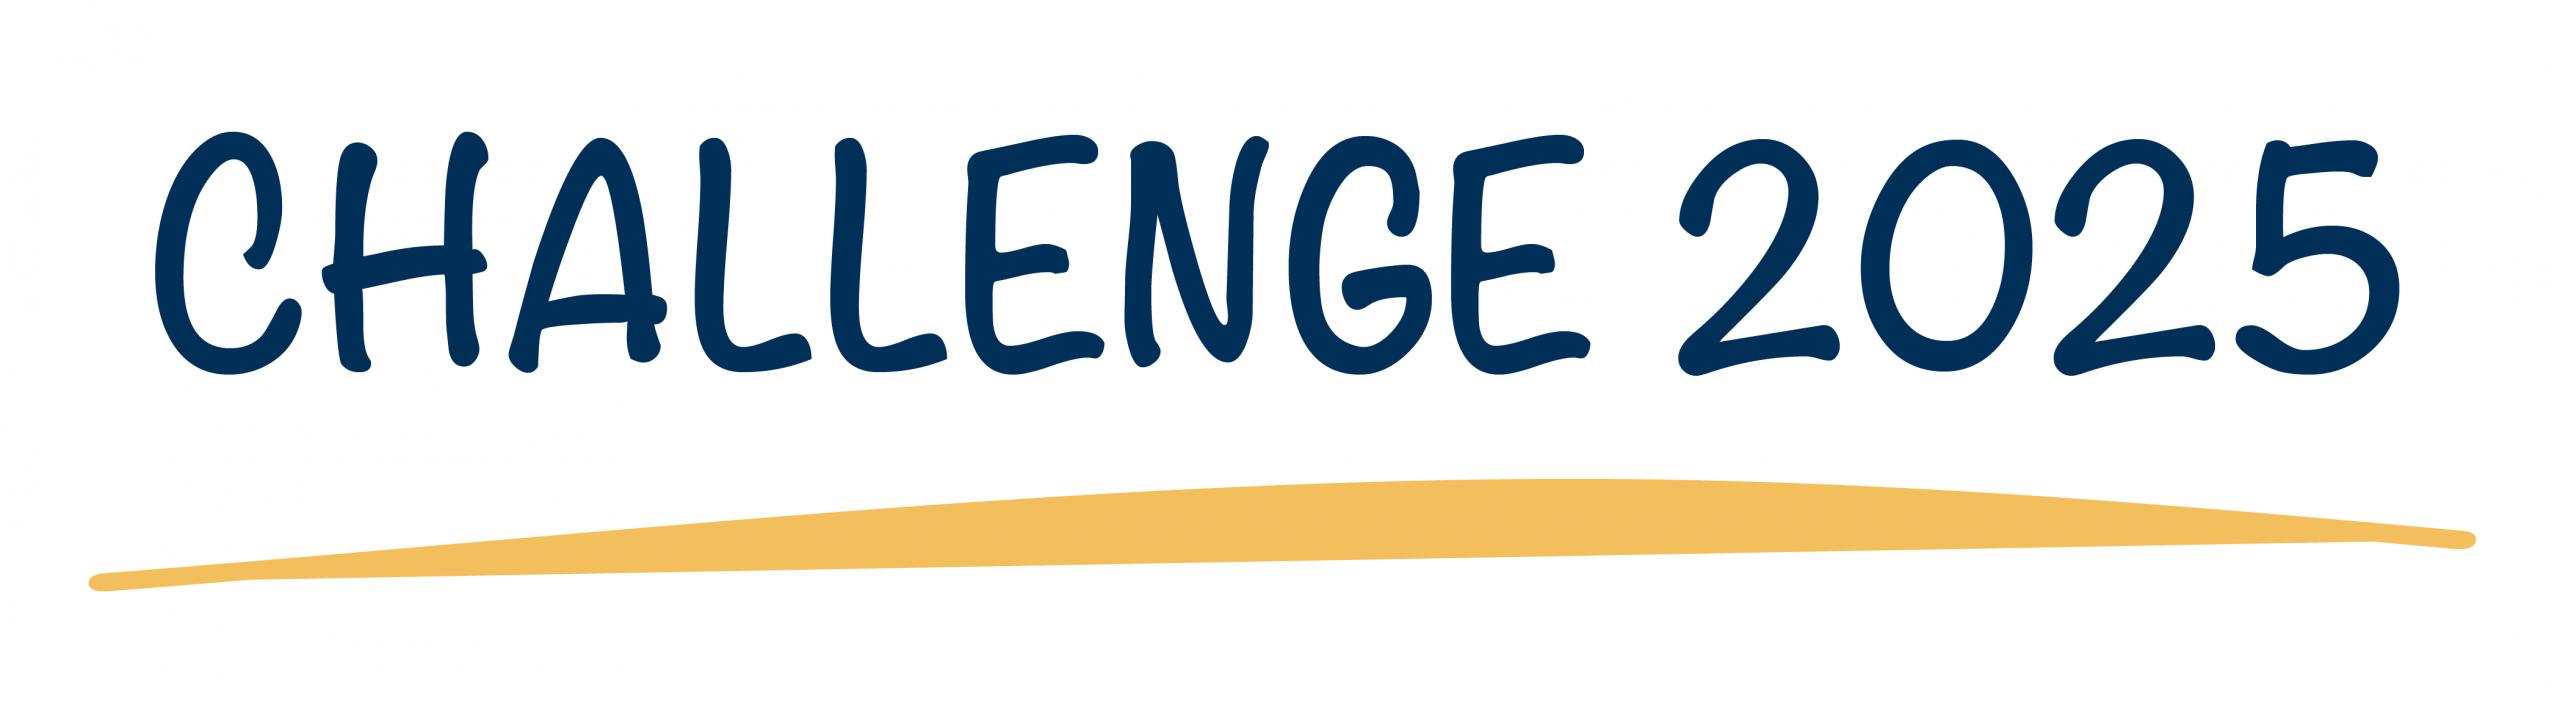 Challenge 2025, Florida Baptist Convention